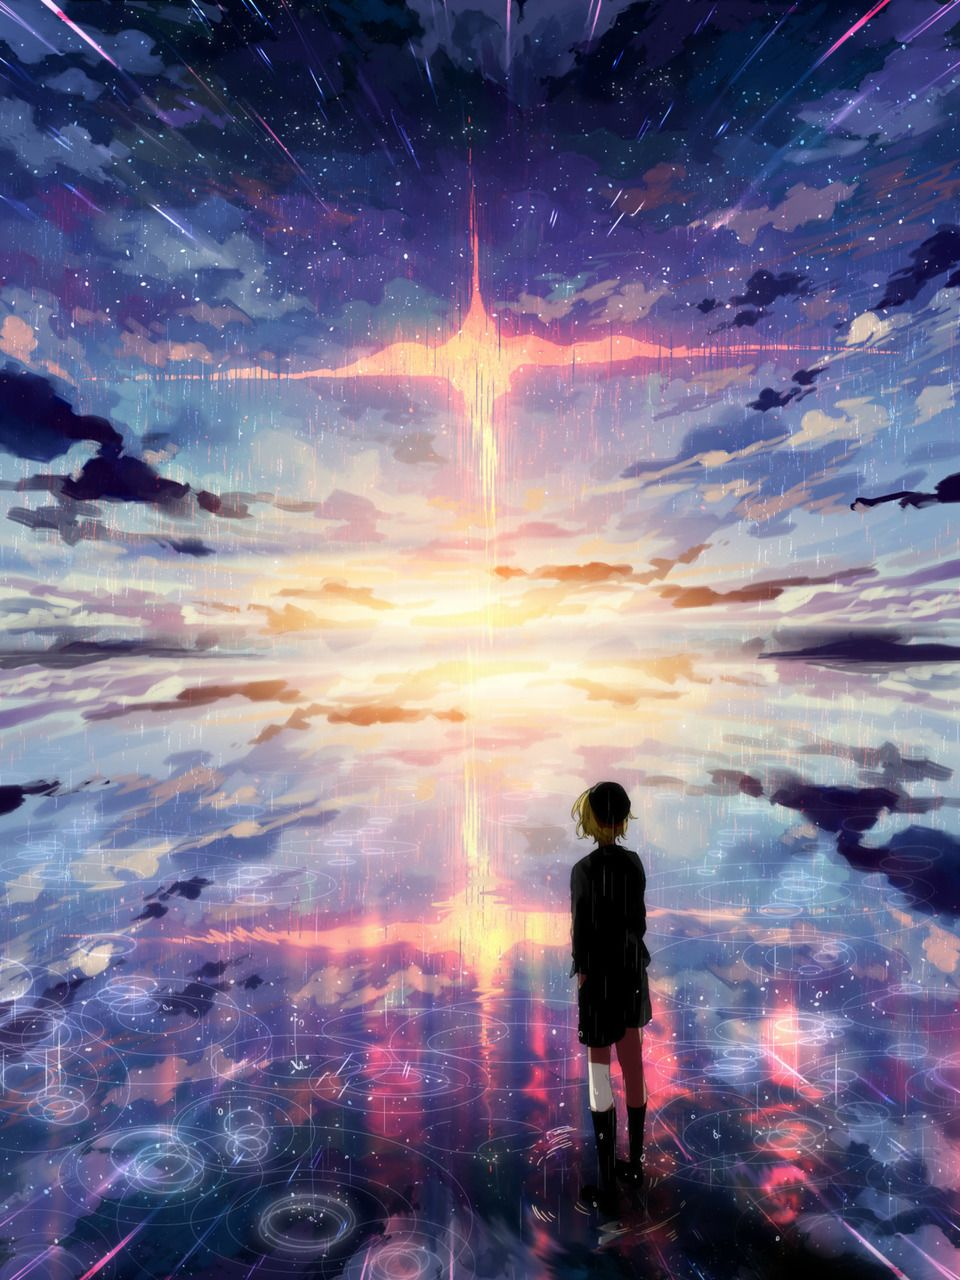 Anime scenery anime scenery anime art scenery